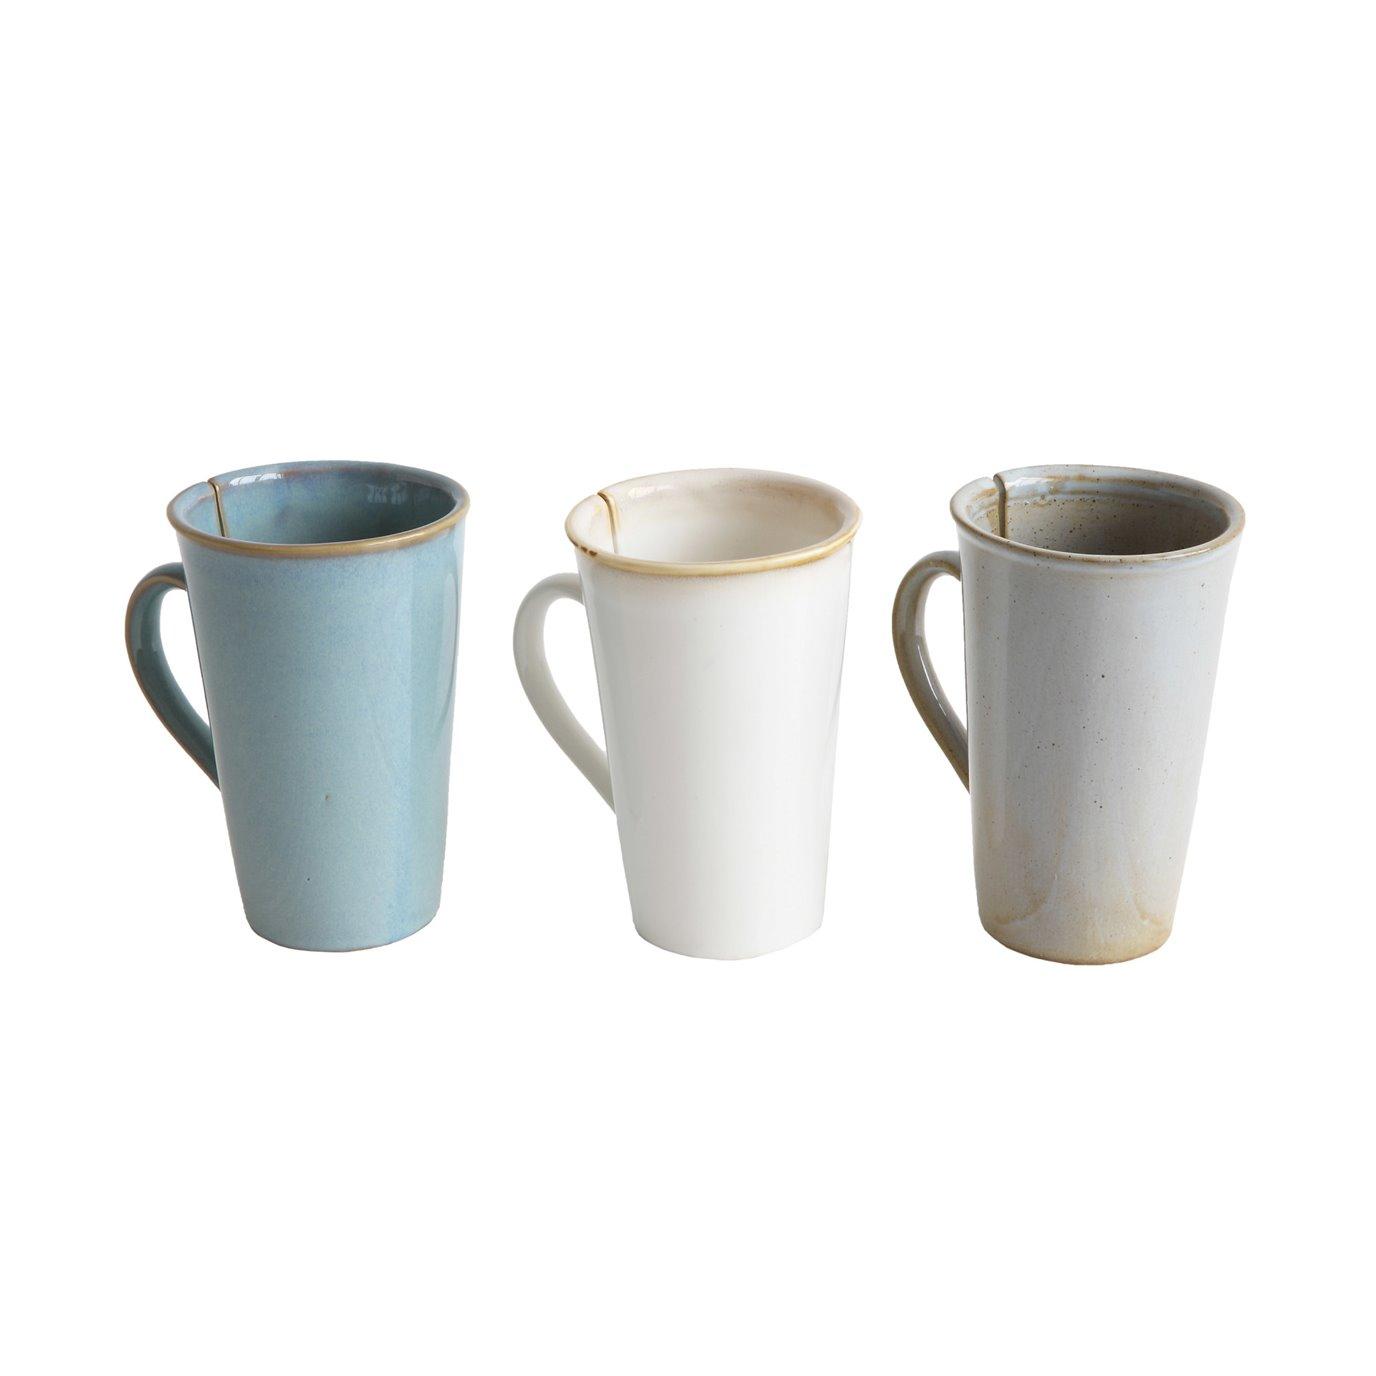 Mugs with Tea Bag Slots on Sides (Set of 3 Colors)